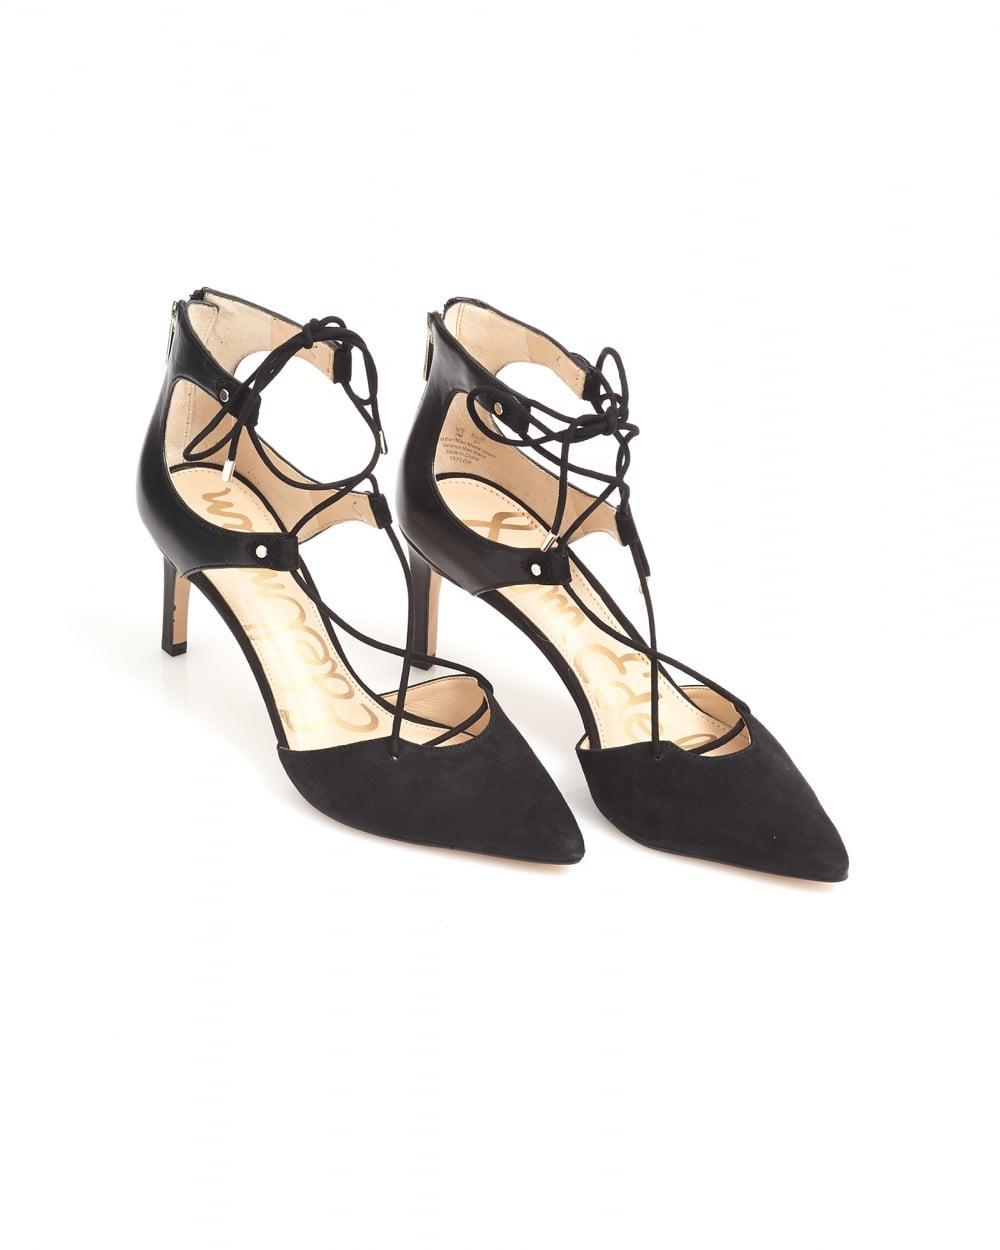 75b5b1f56 Lyst - Sam Edelman Taylor Court Shoes